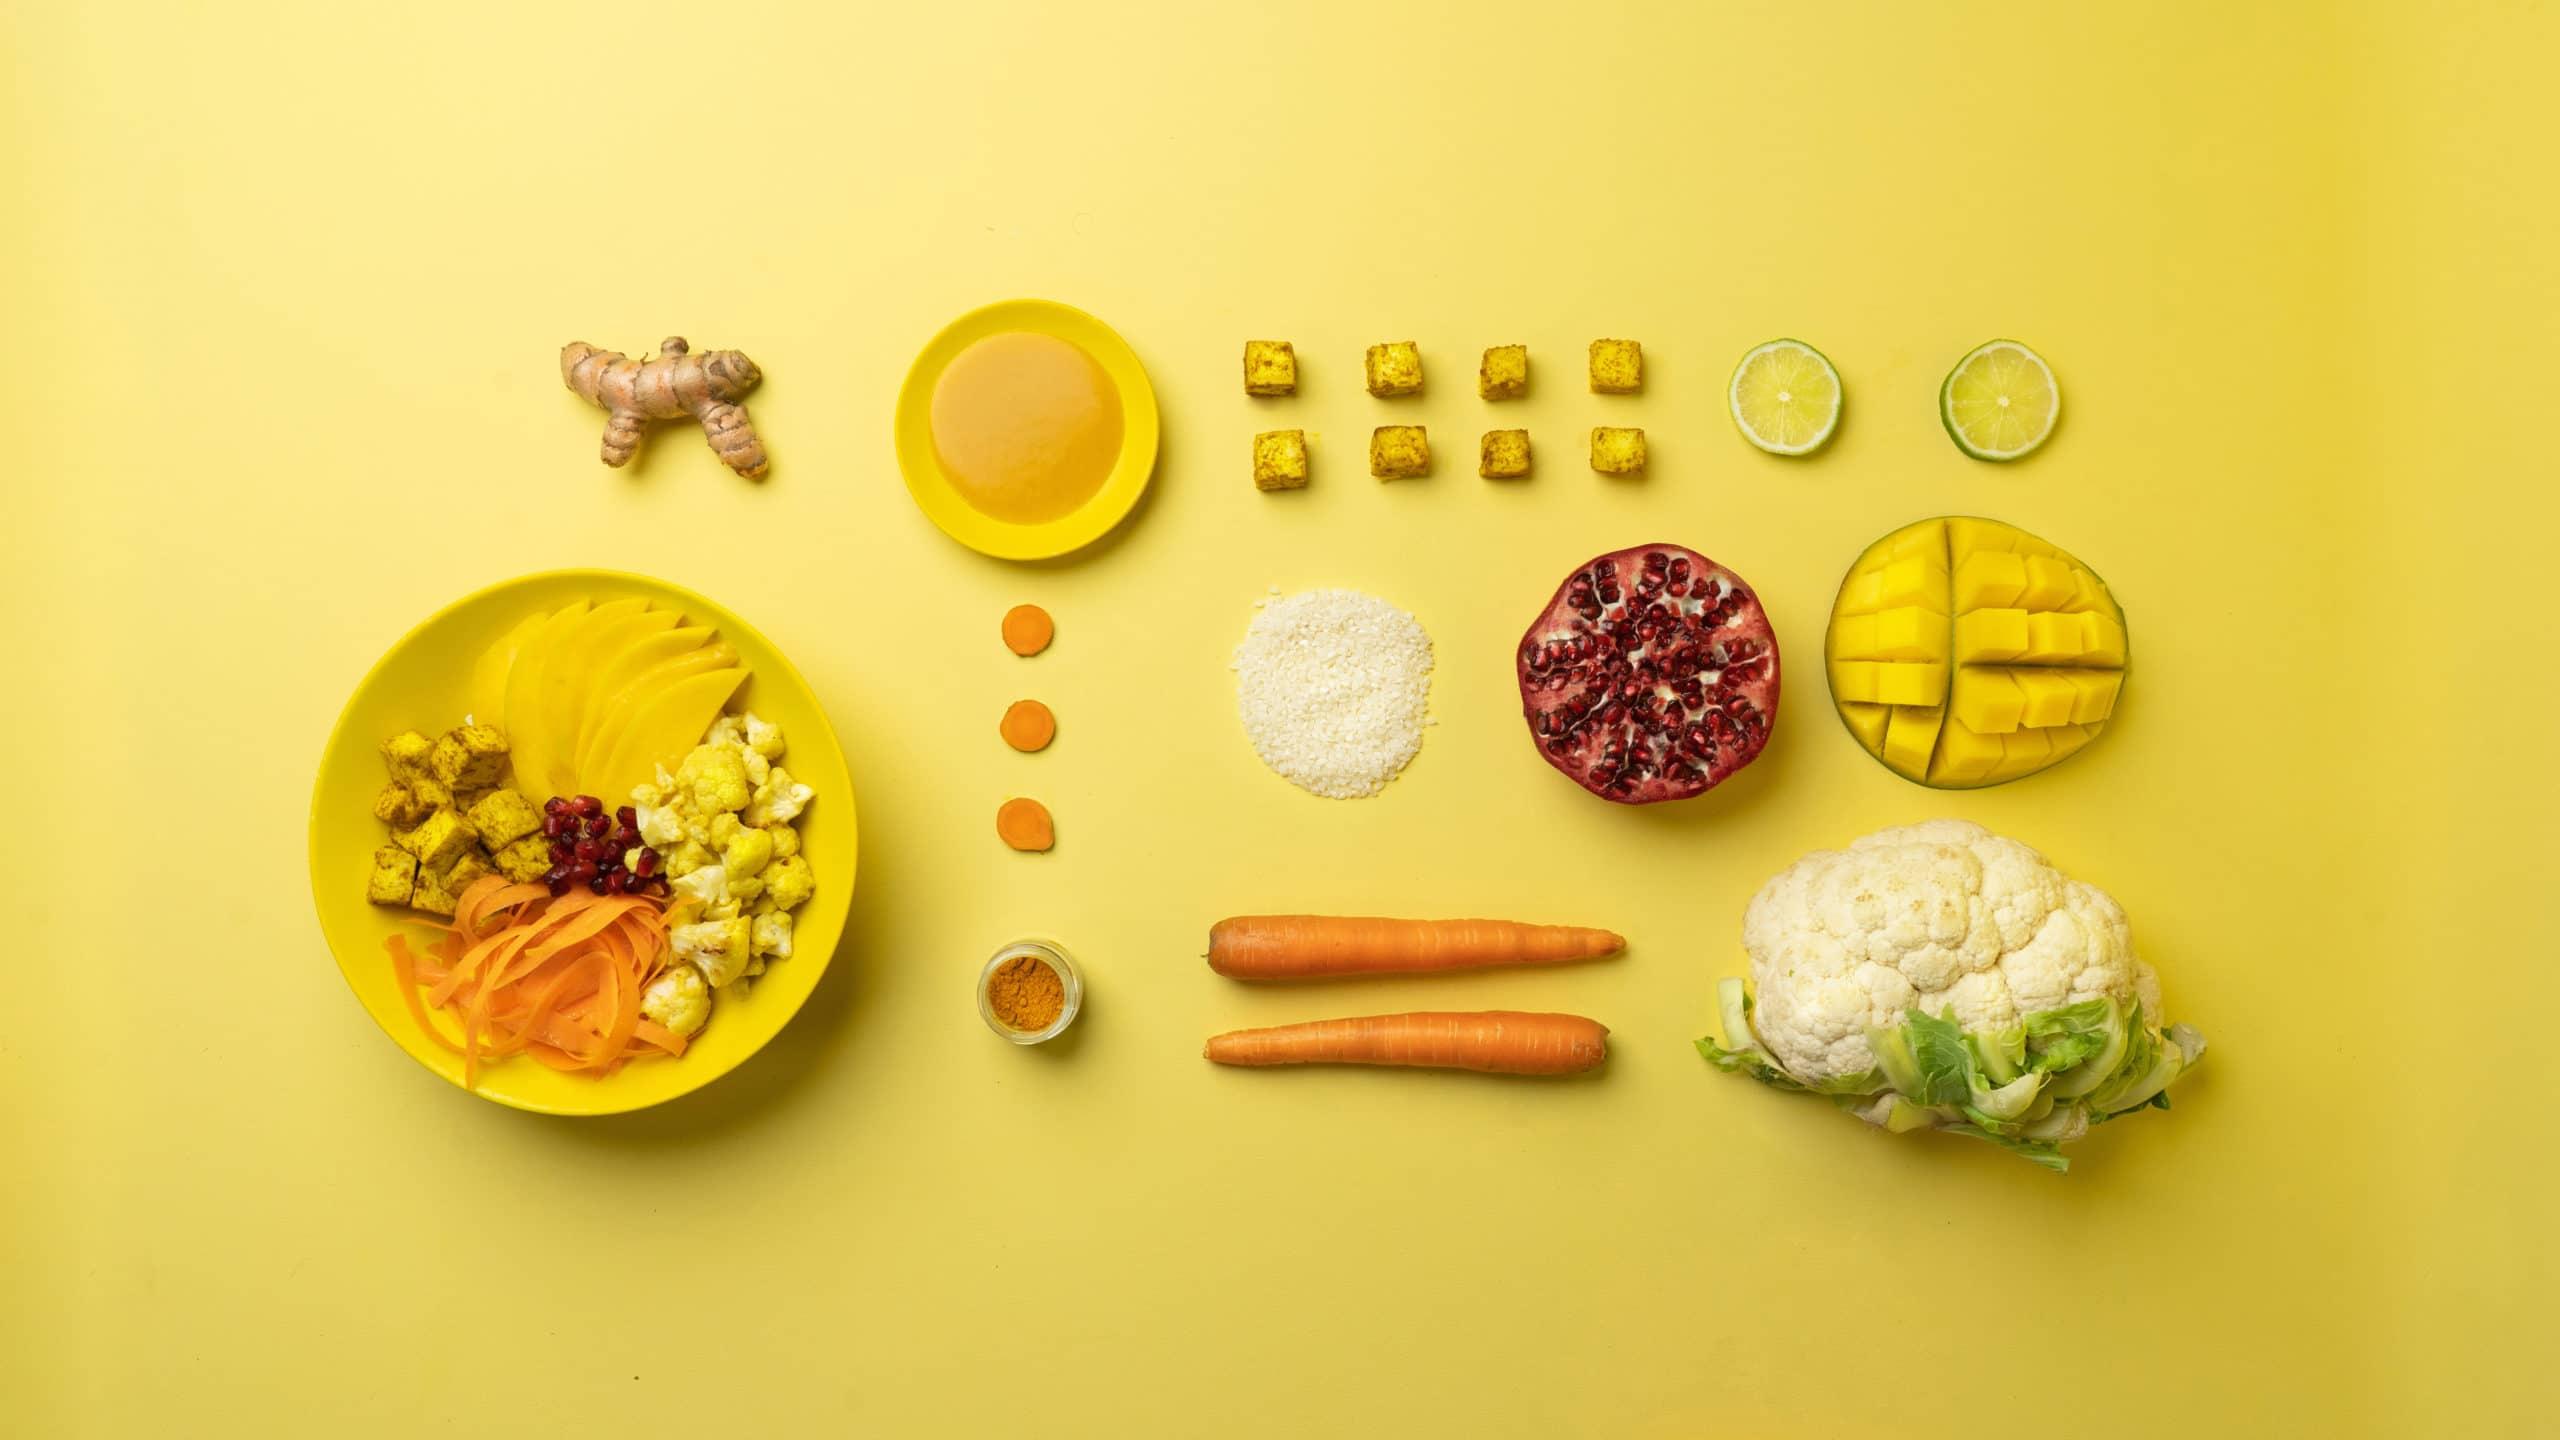 Decomposition du bowl Yellow Sunshine Moko Moko Gardlab